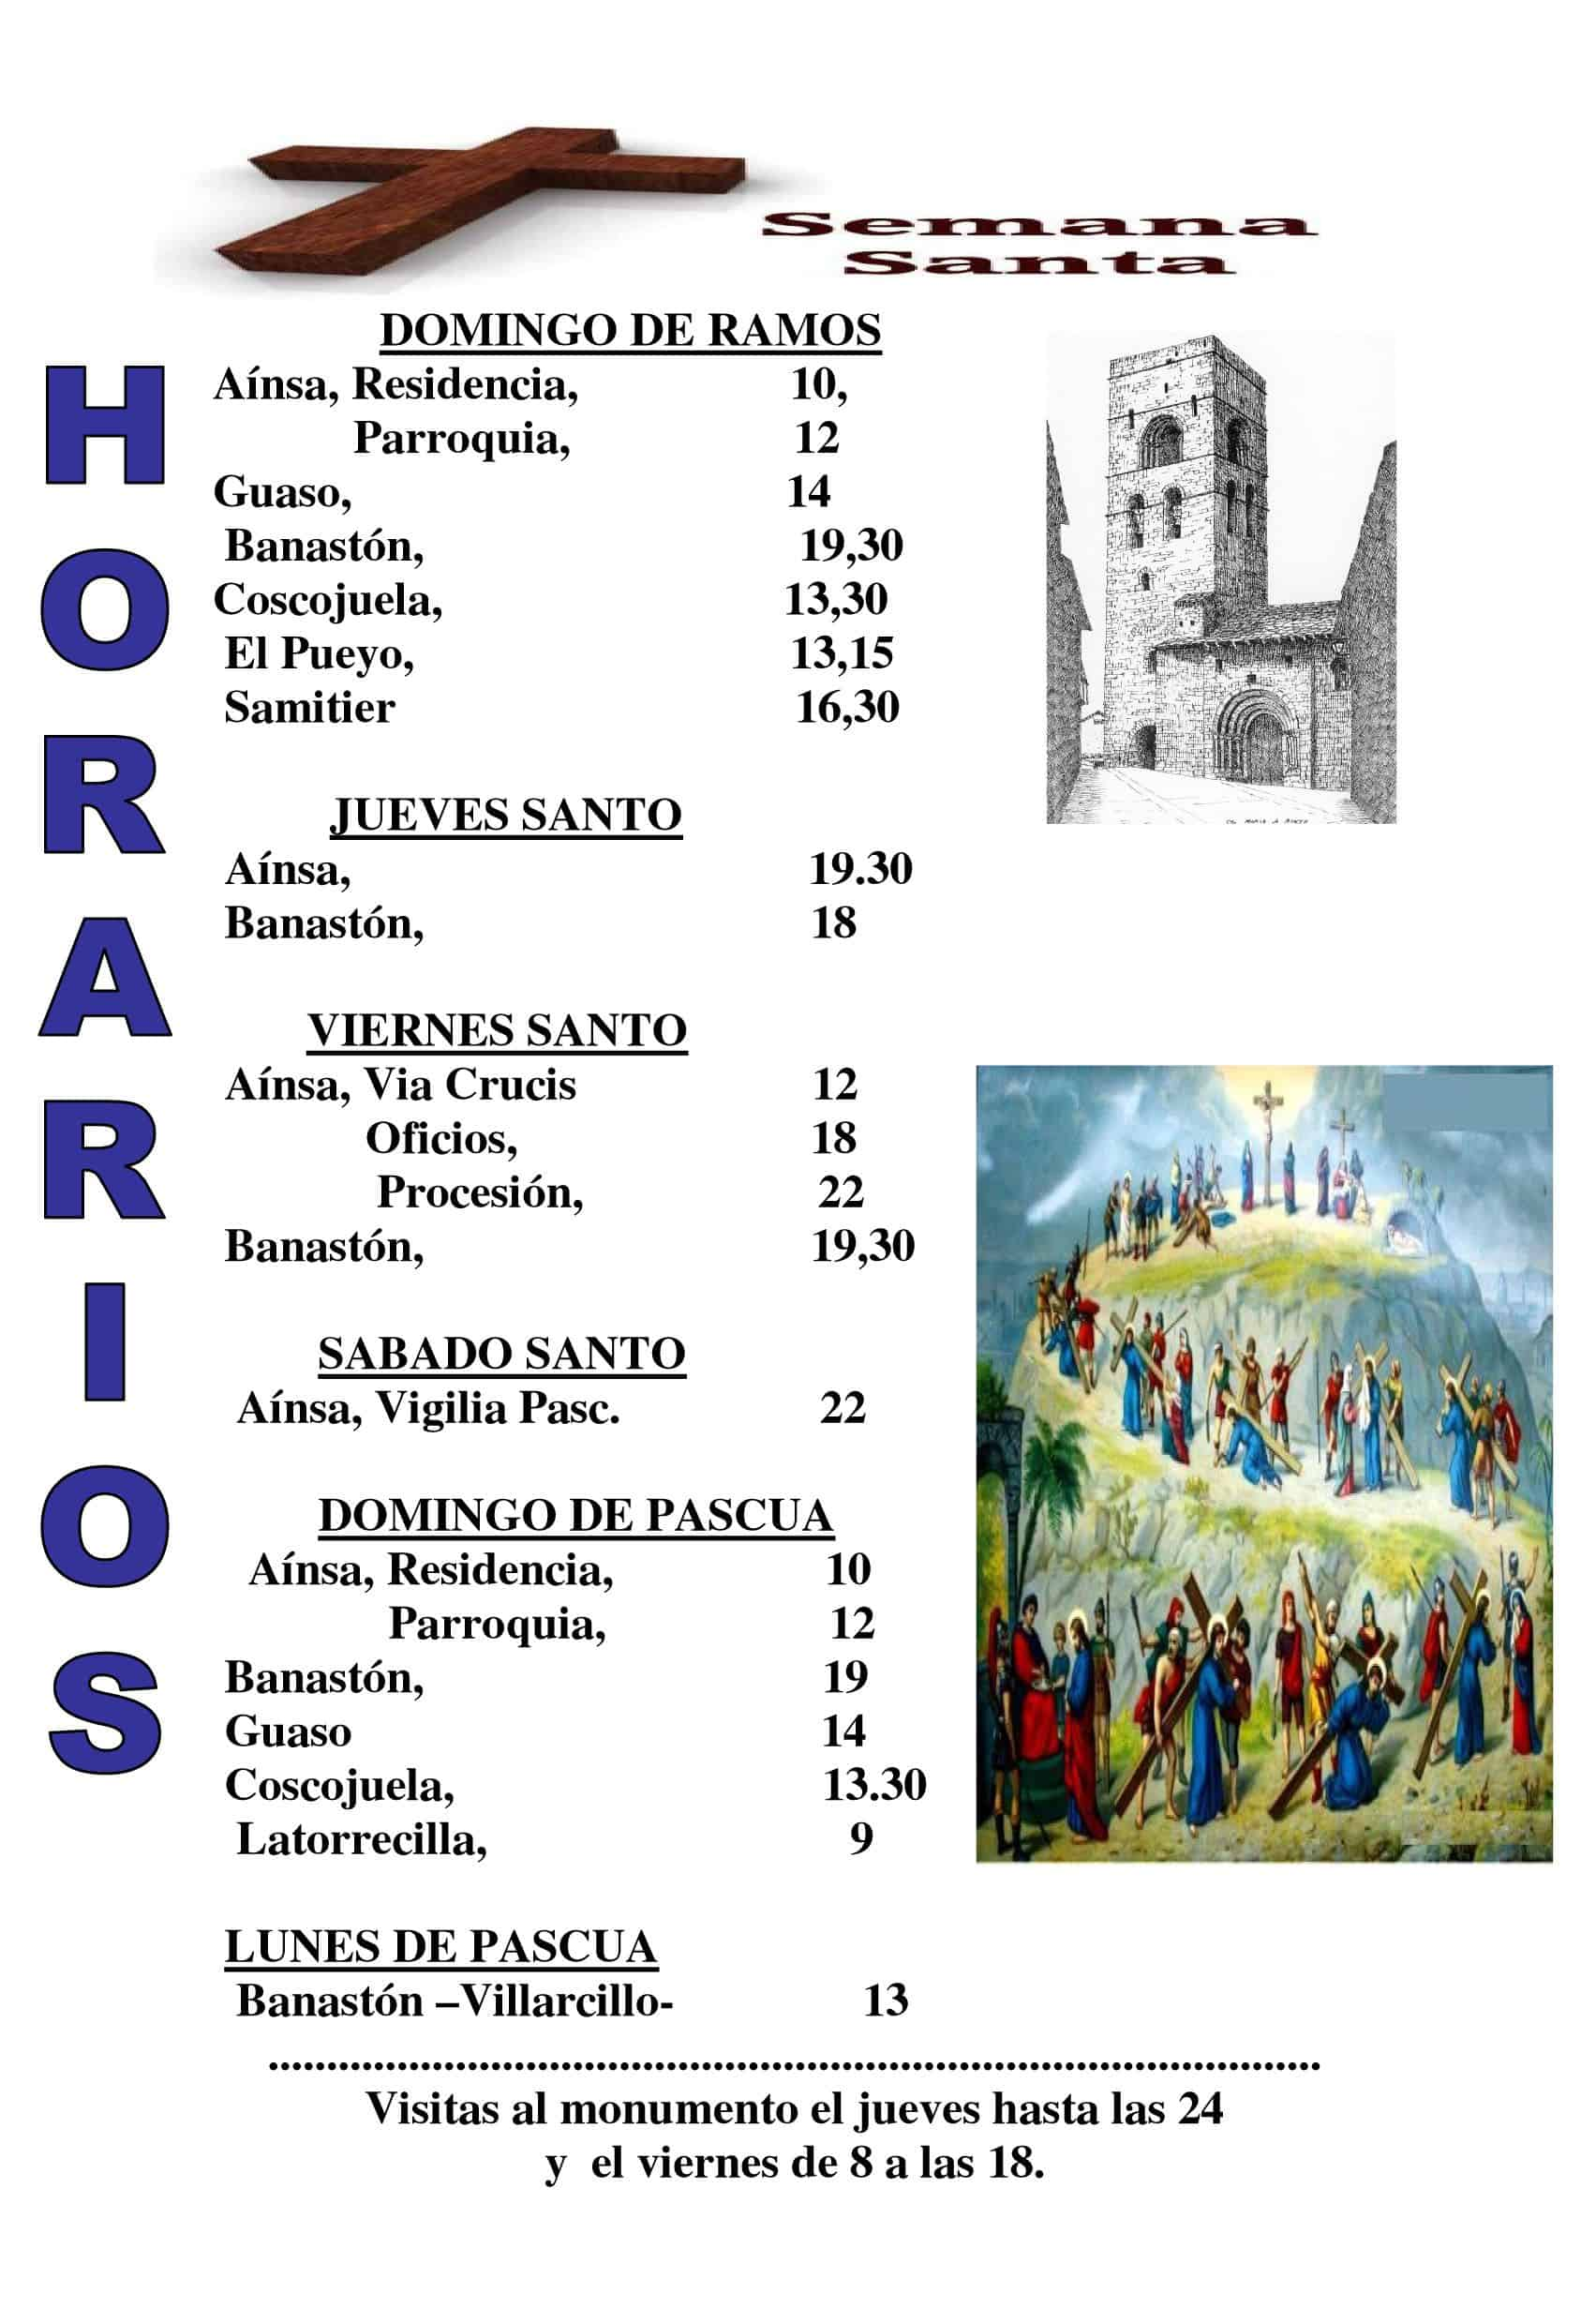 semana-santa-2013-parroquia-ainsa_copiar.jpg